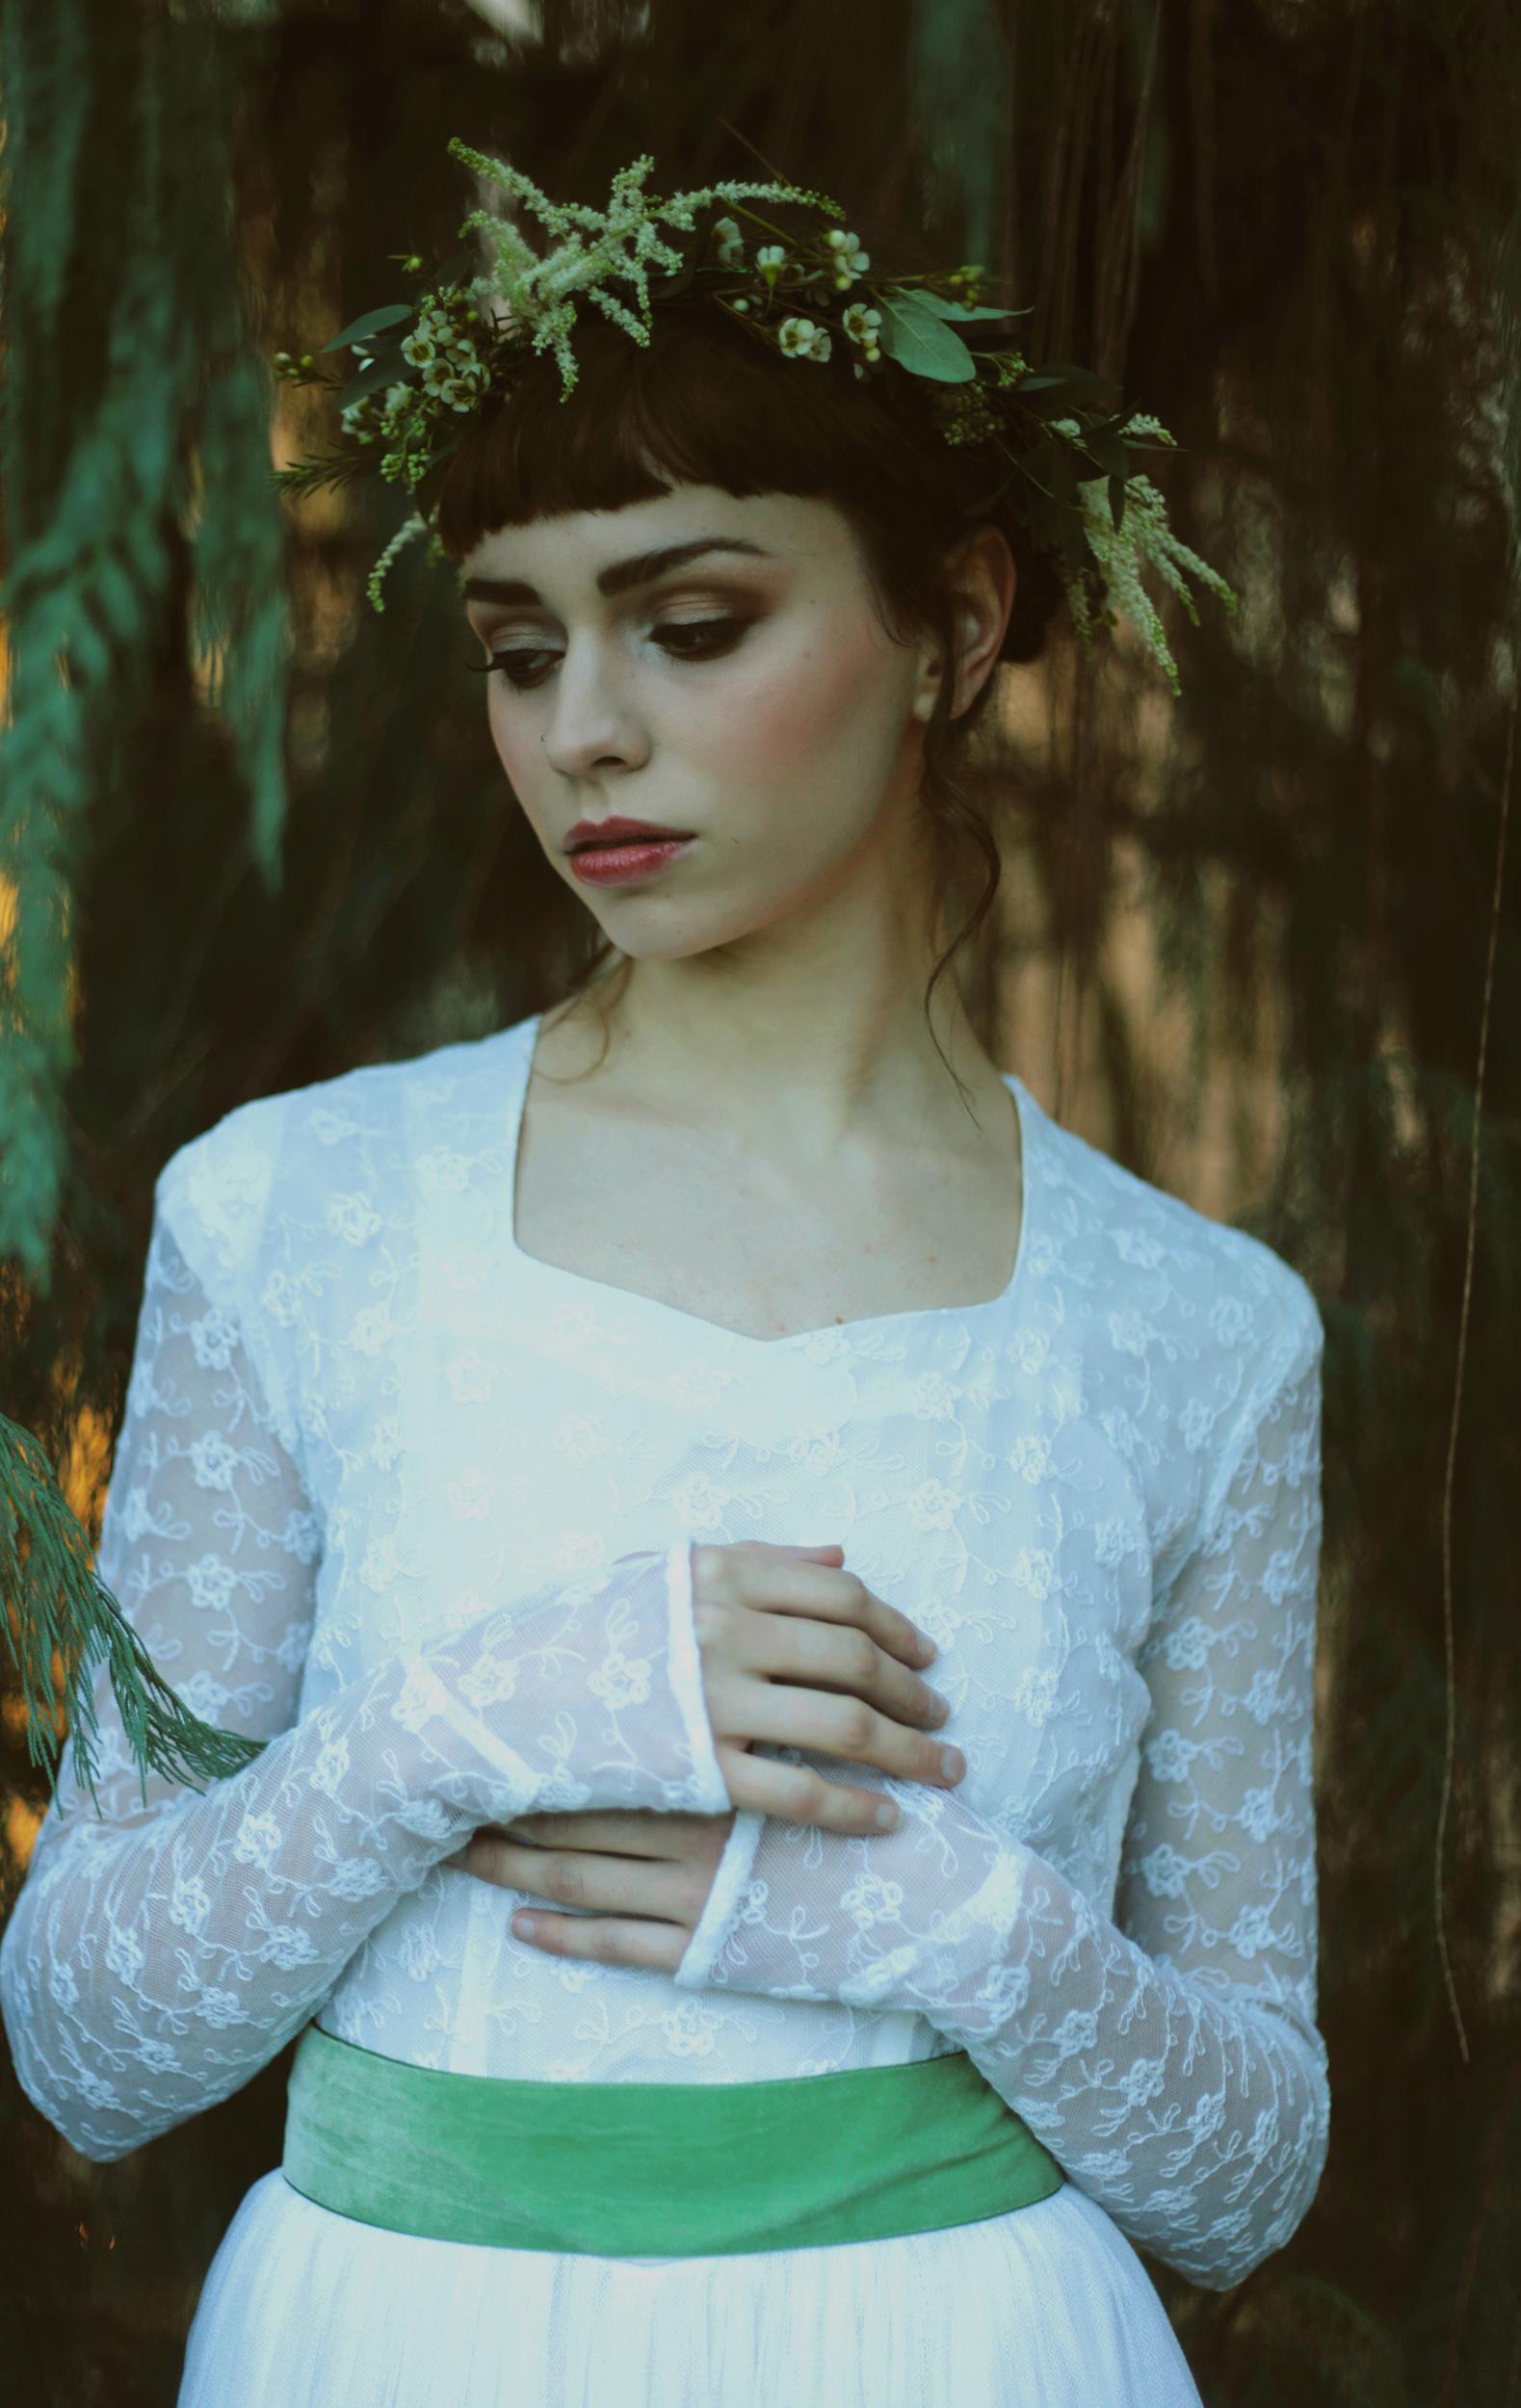 Winter-Bridal-Kate-Beaumont-Shelley-Richmond-Vintage-Wedding-Dress-22.jpg